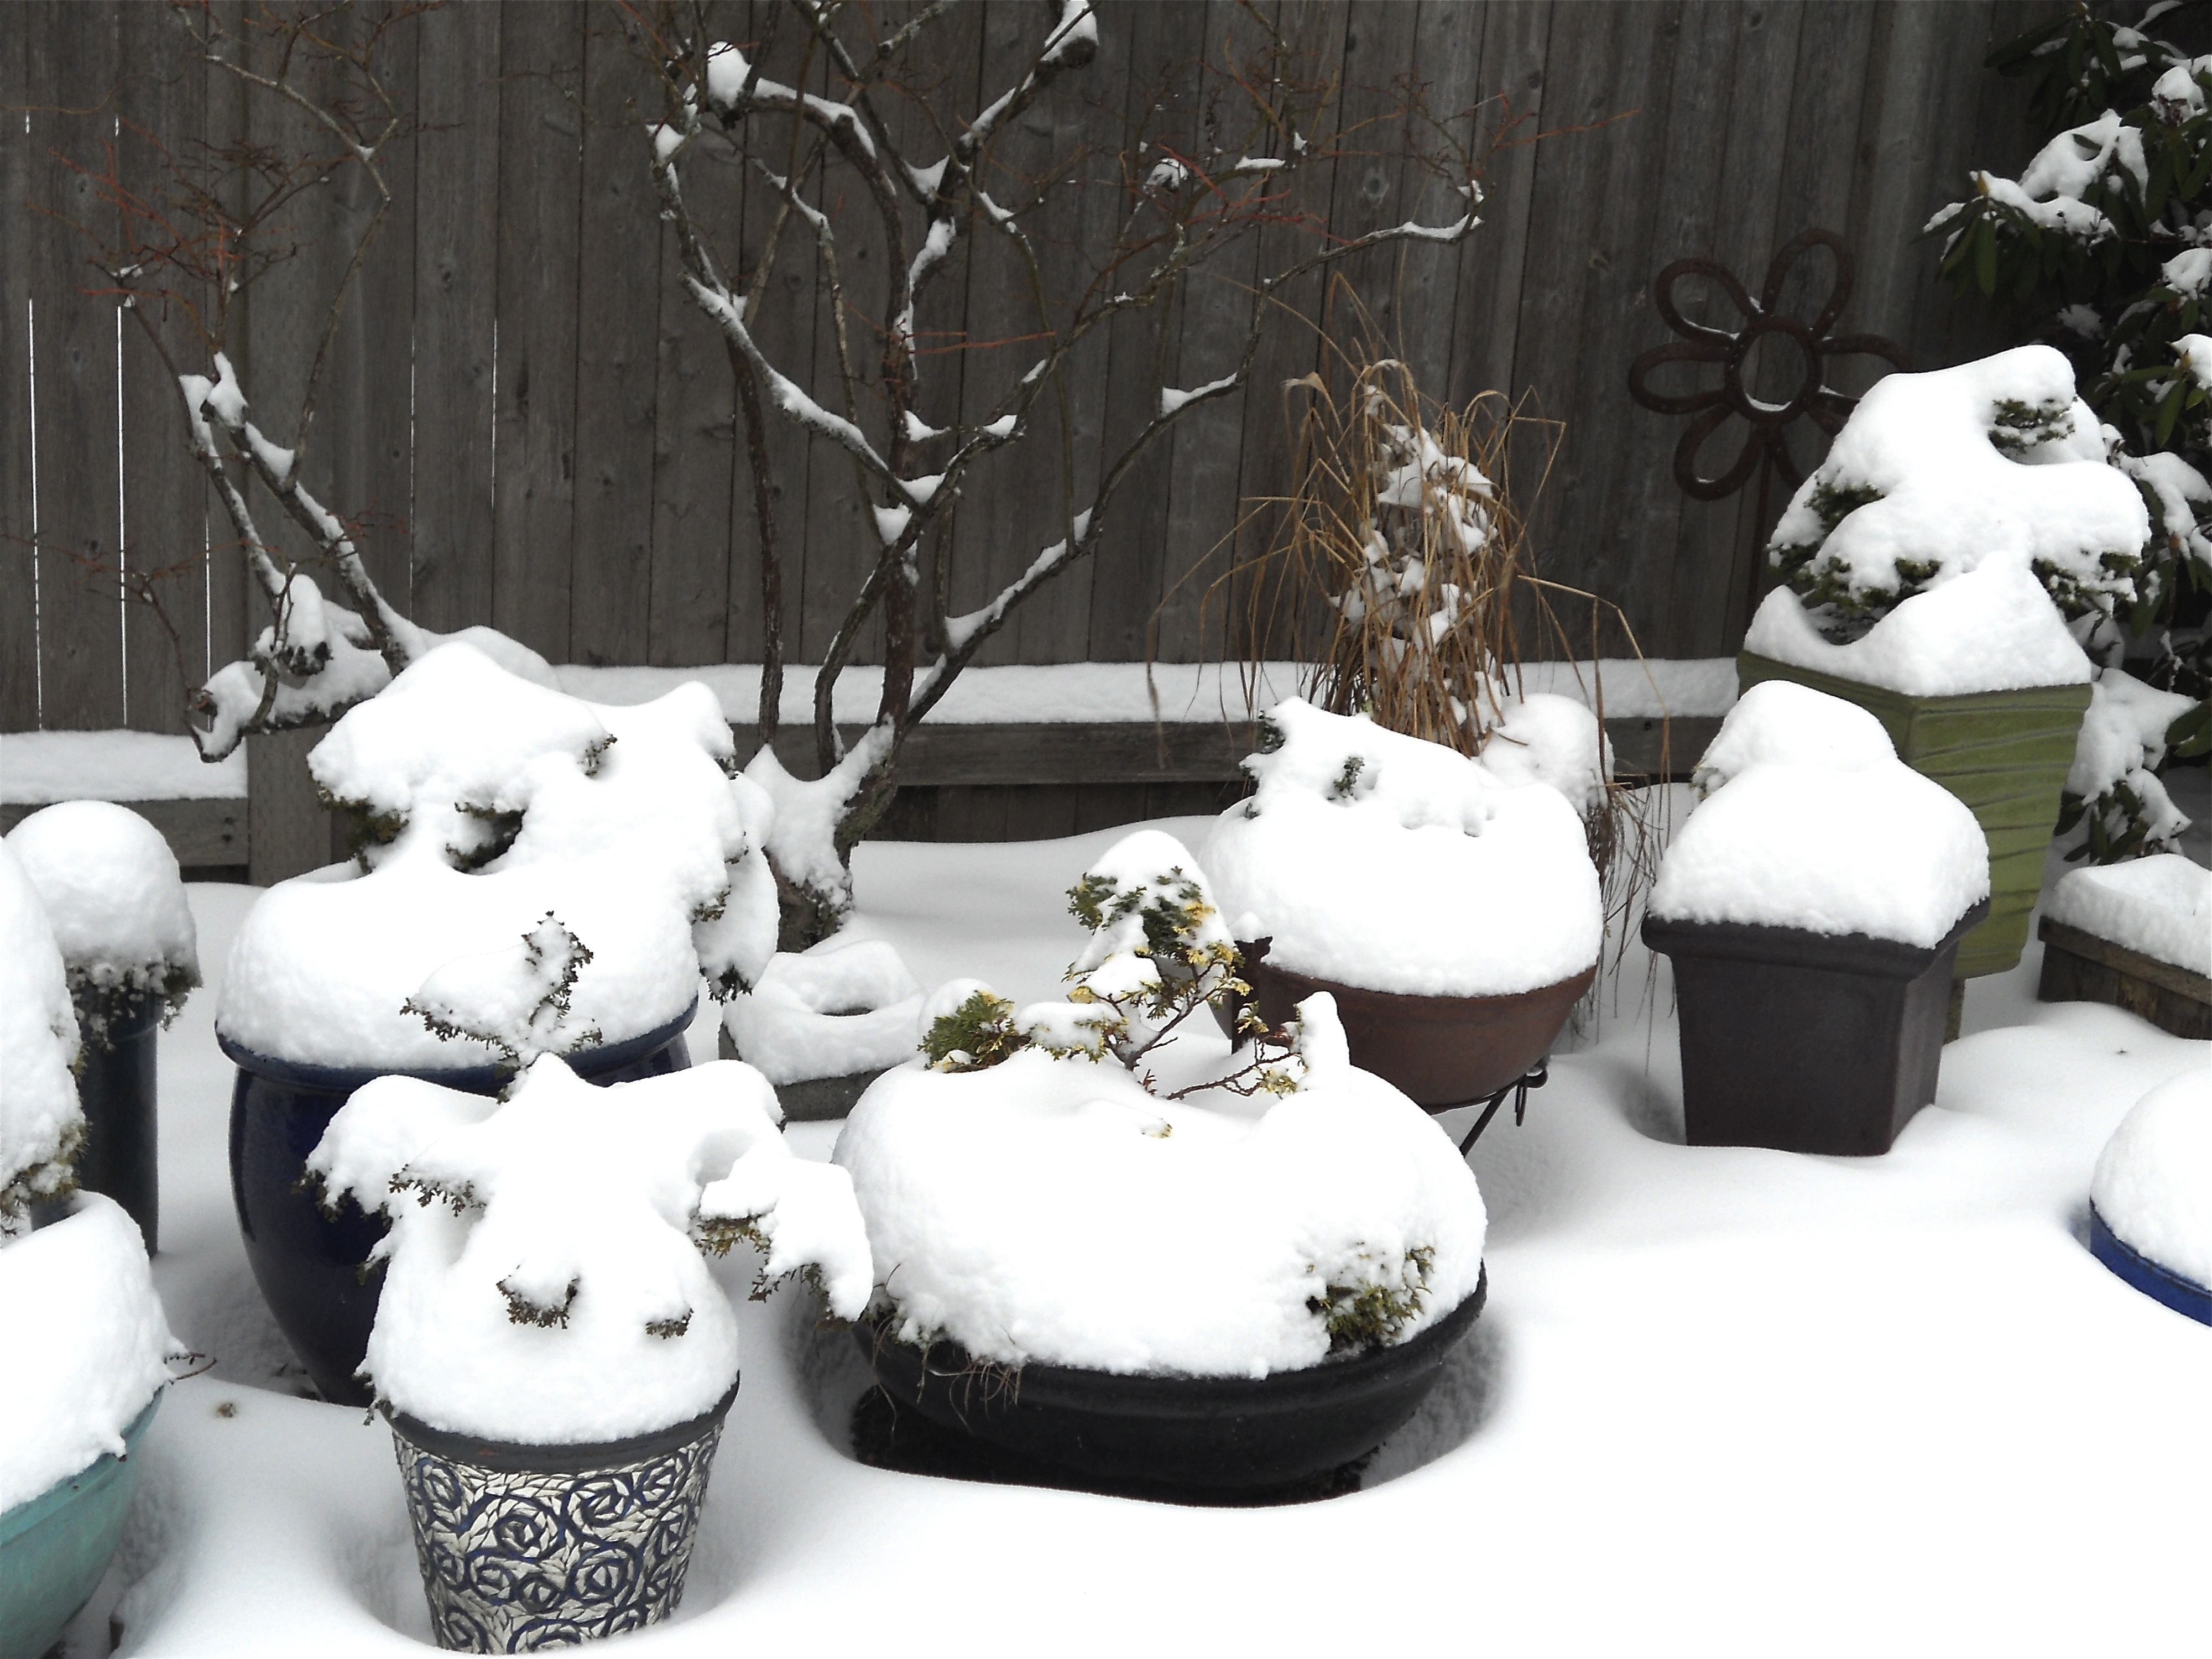 Miniature Gardens frozen in time